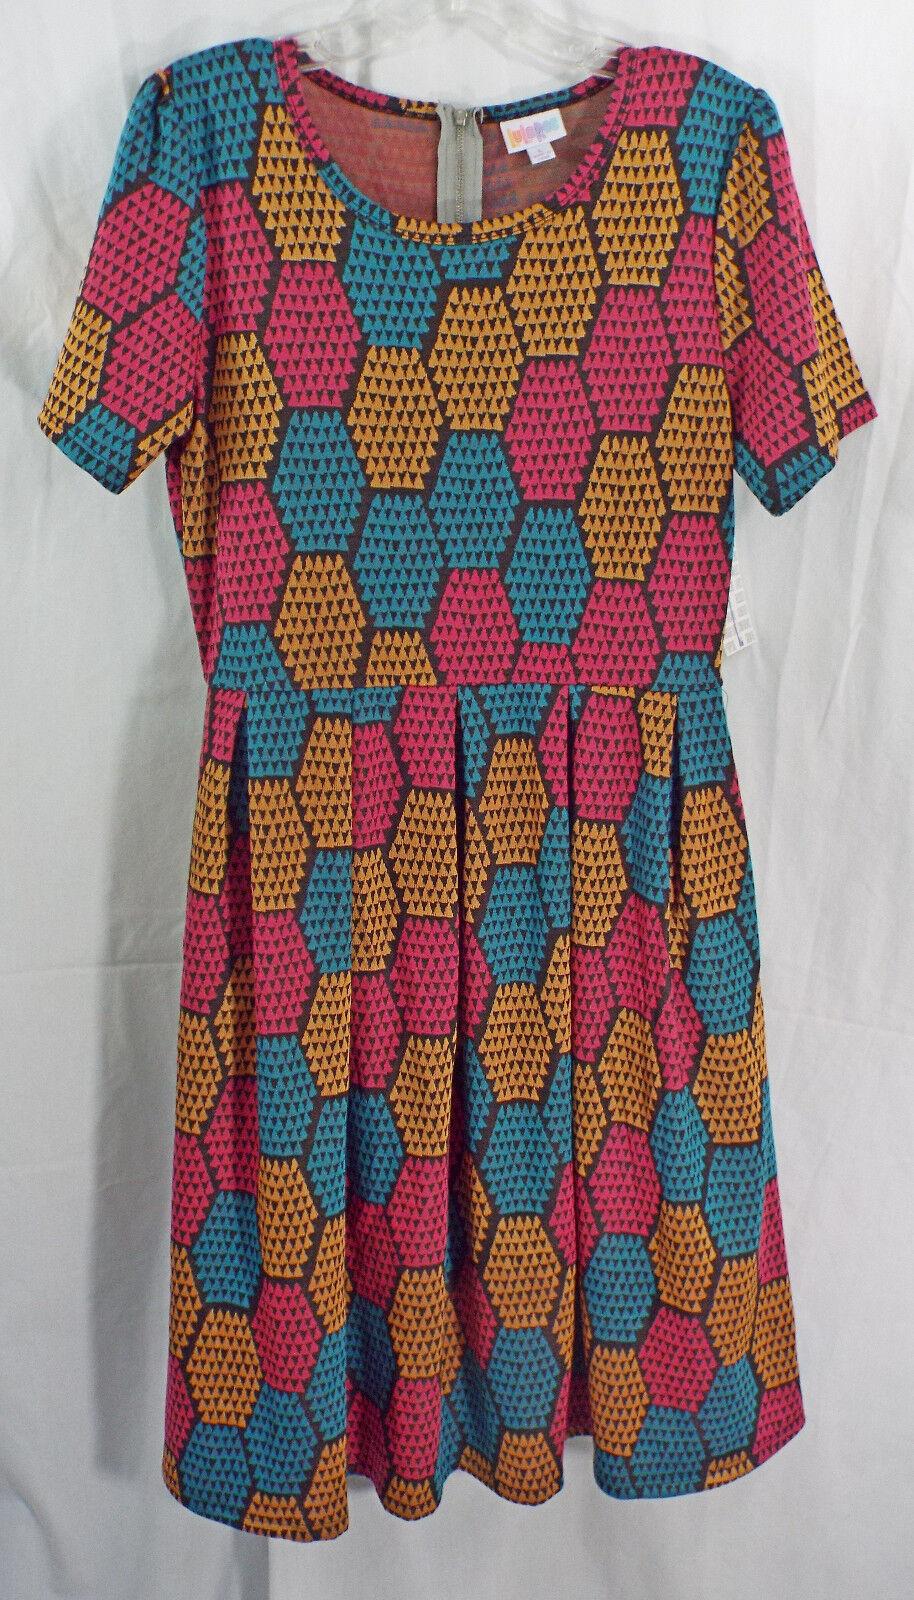 damen LuLaRoe Dress LARGE Amelia Multi ColGoldt Texturot Pattern NWT